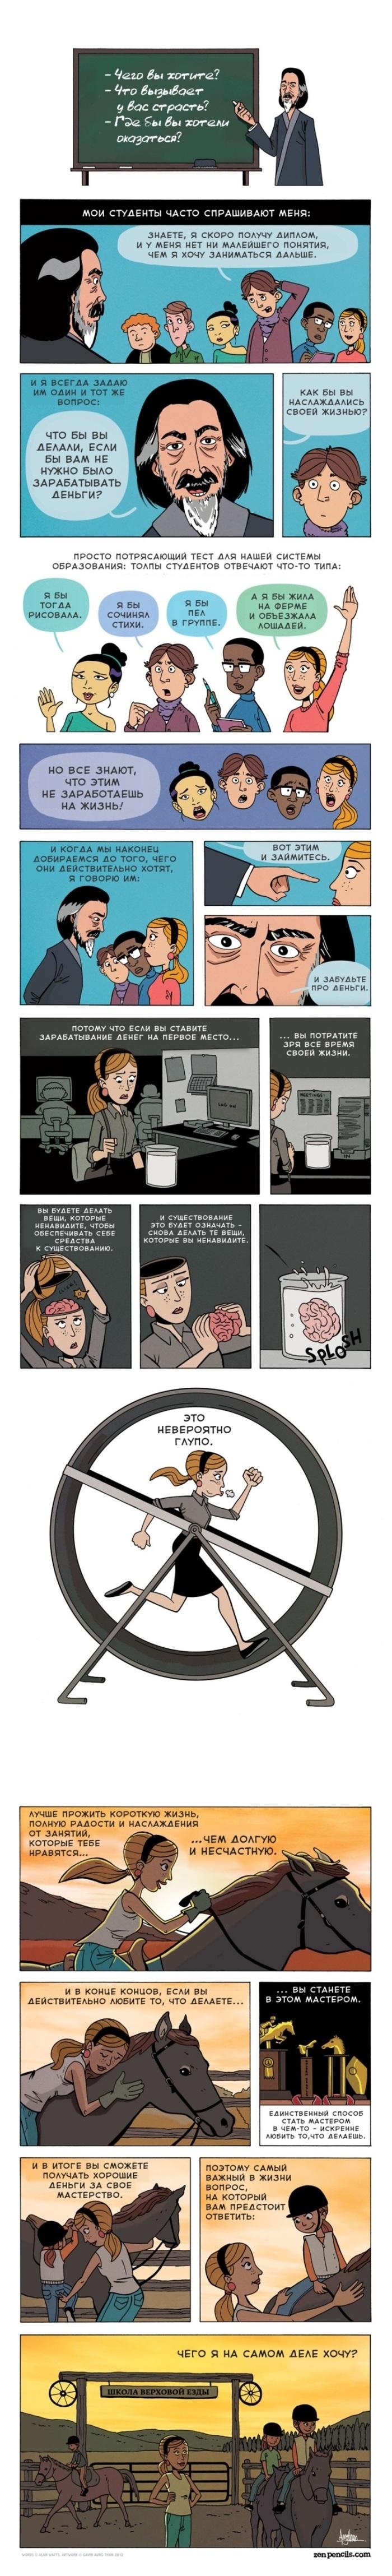 Комиксы-мотивация-работа-хобби-953703